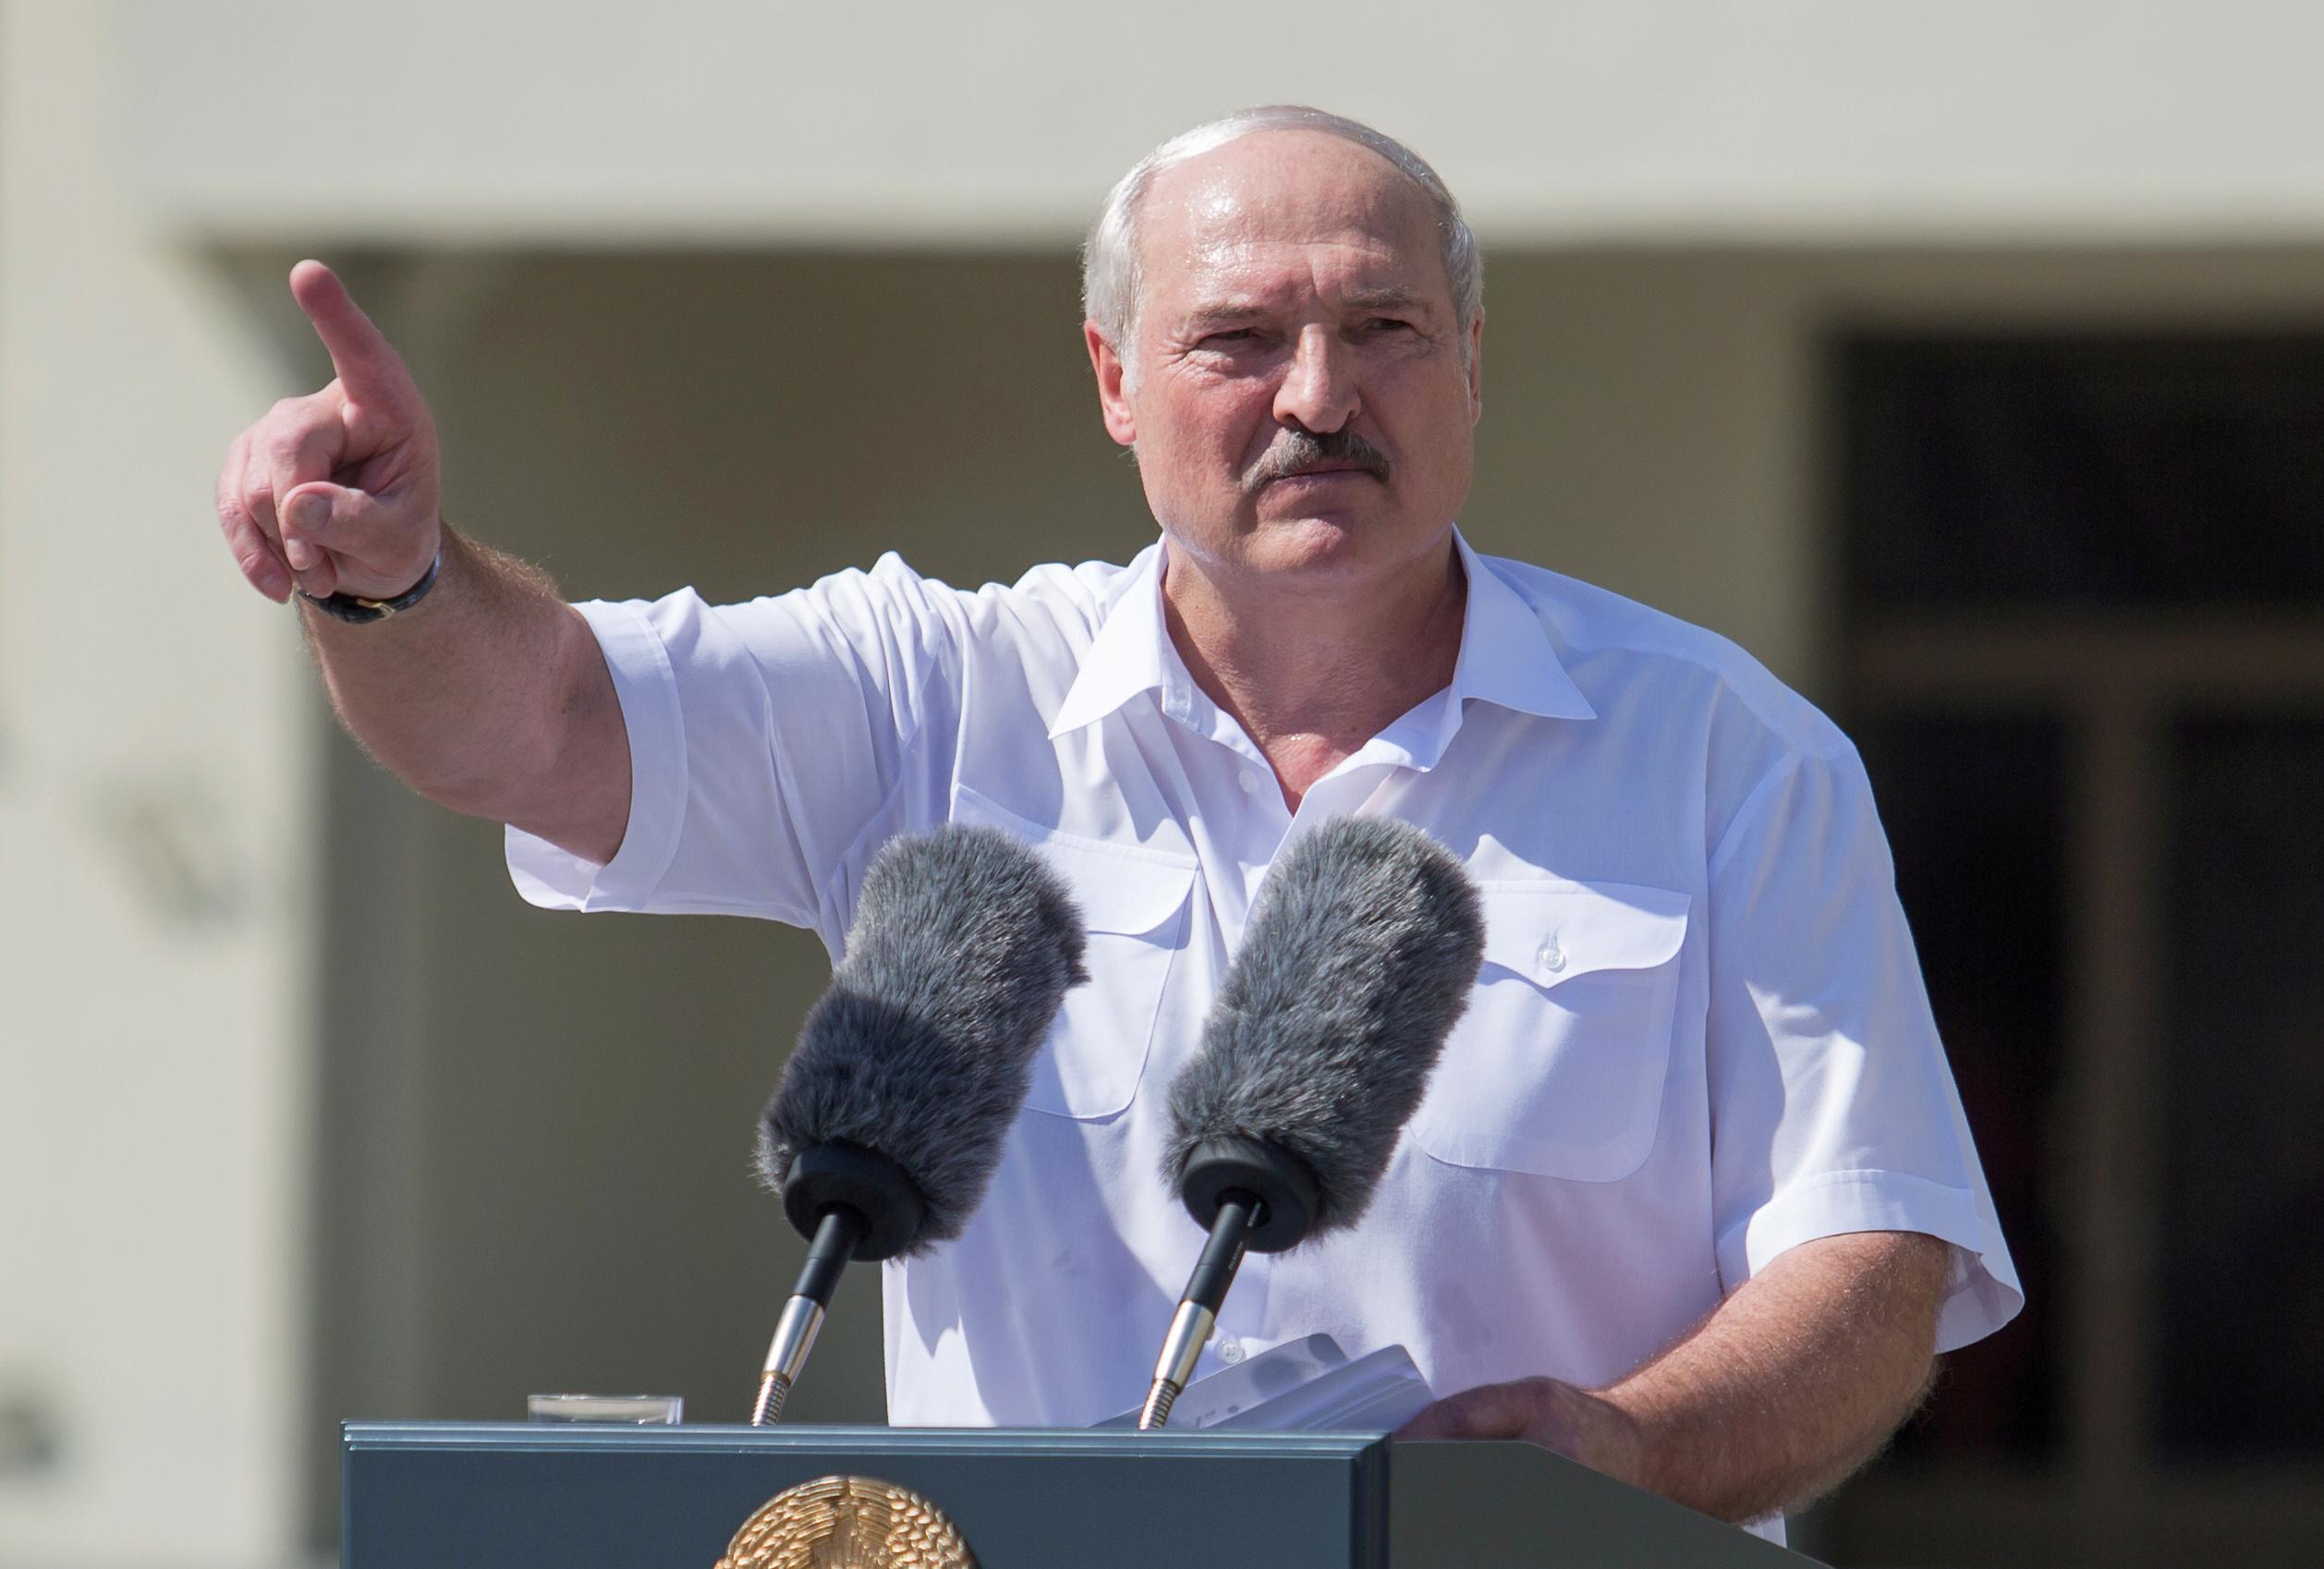 Presidente de Belarus, Alexander Lukashenko discursa em Minsk